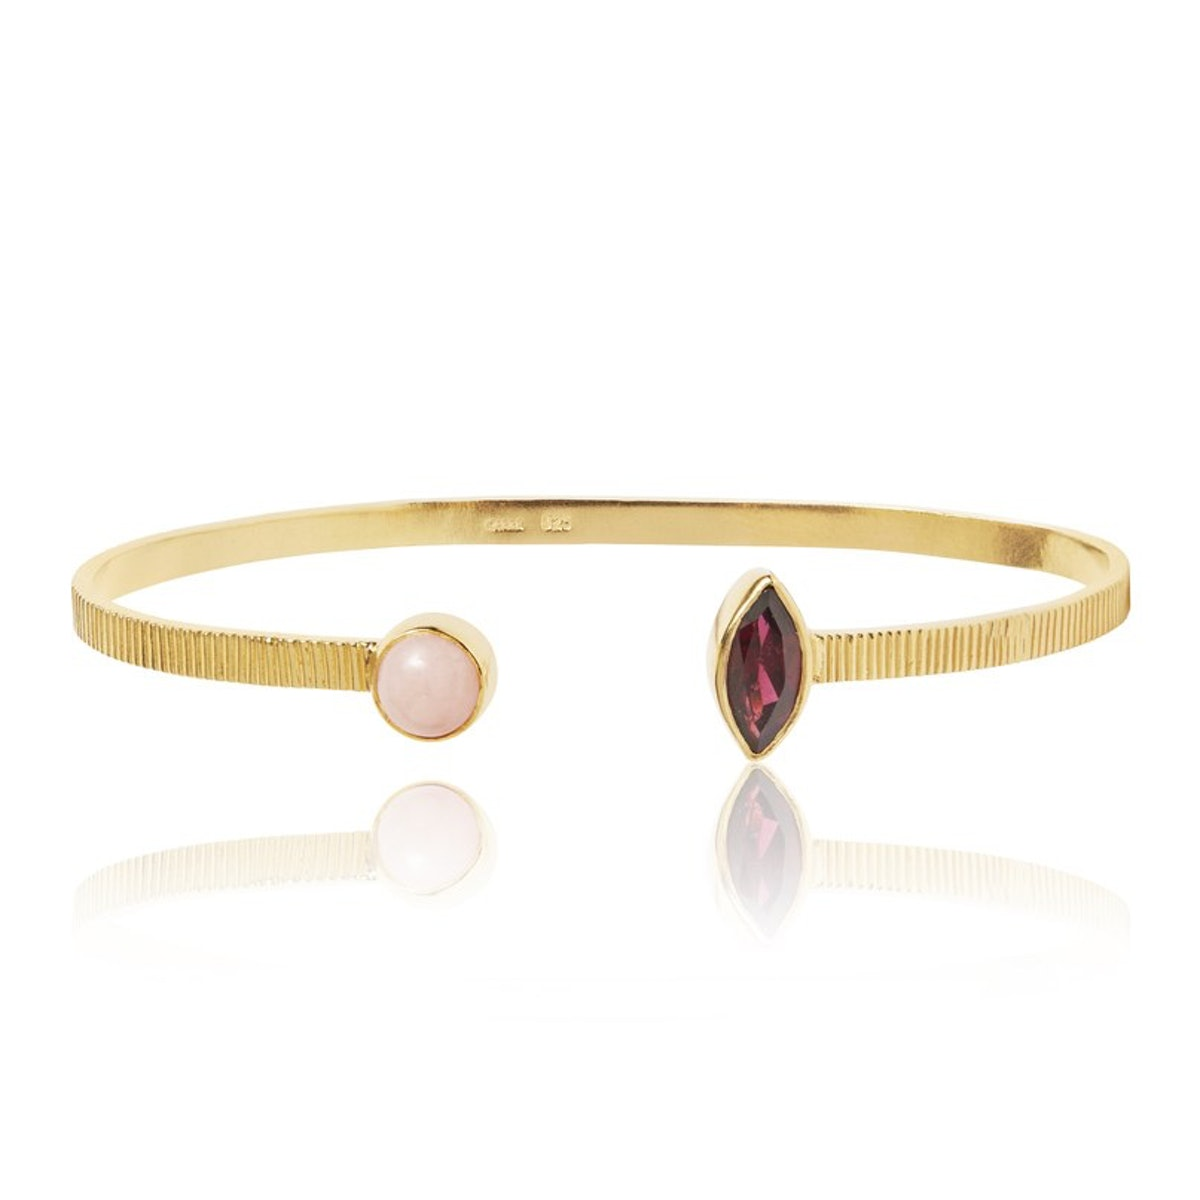 Carre_bracelet_goldplated_DKK1600_1 (1).jpg